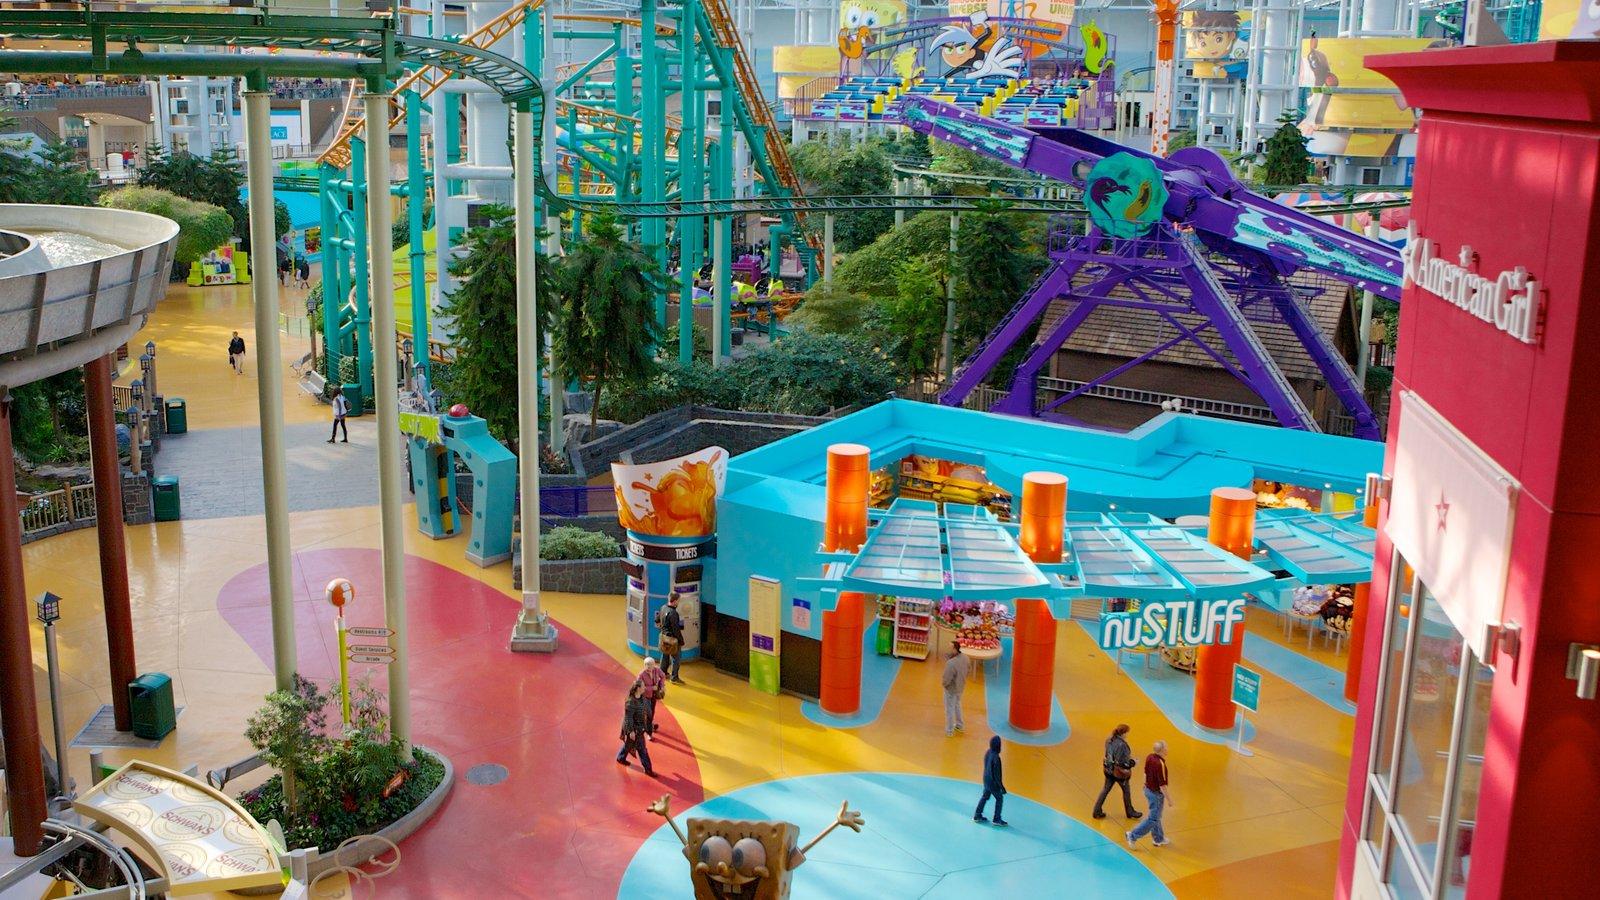 Nickelodeon Universe mostrando distrito comercial central, cenas de rua e uma cidade